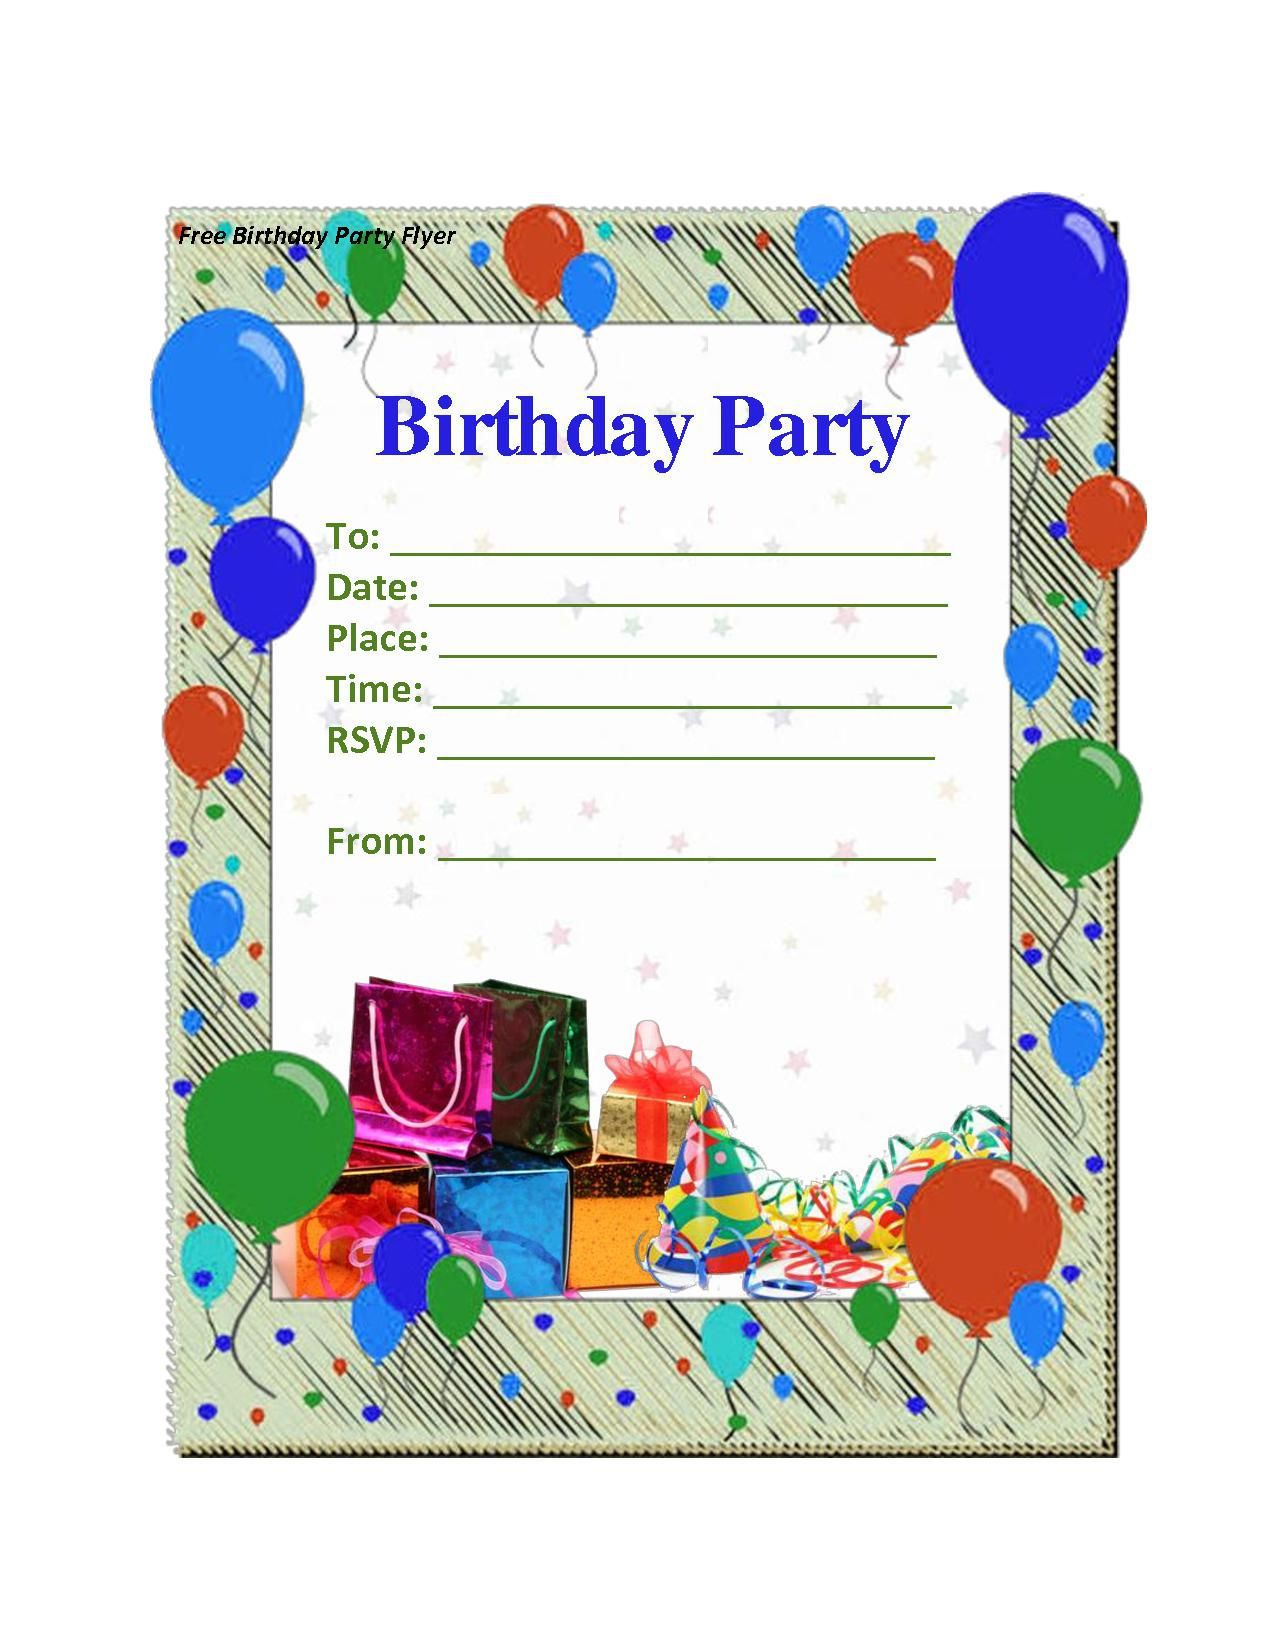 005 Dreaded Free Online Birthday Invitation Maker Printable Highest Clarity  1st CardFull